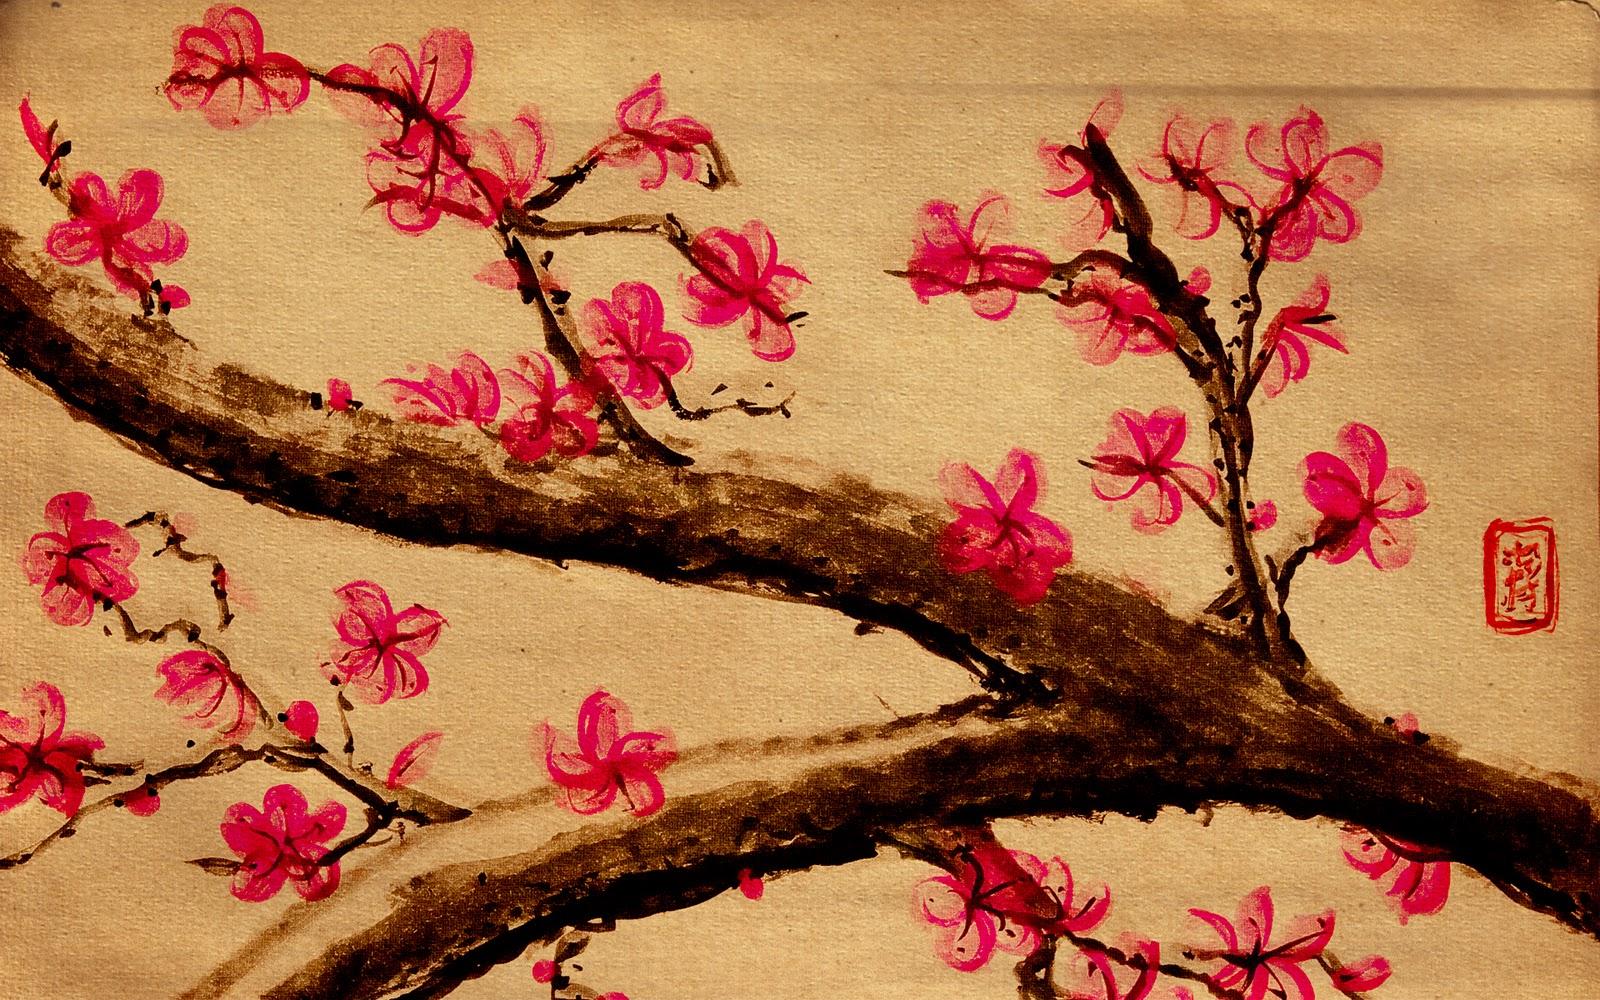 46 Japanese Cherry Blossom Wallpapers On Wallpapersafari